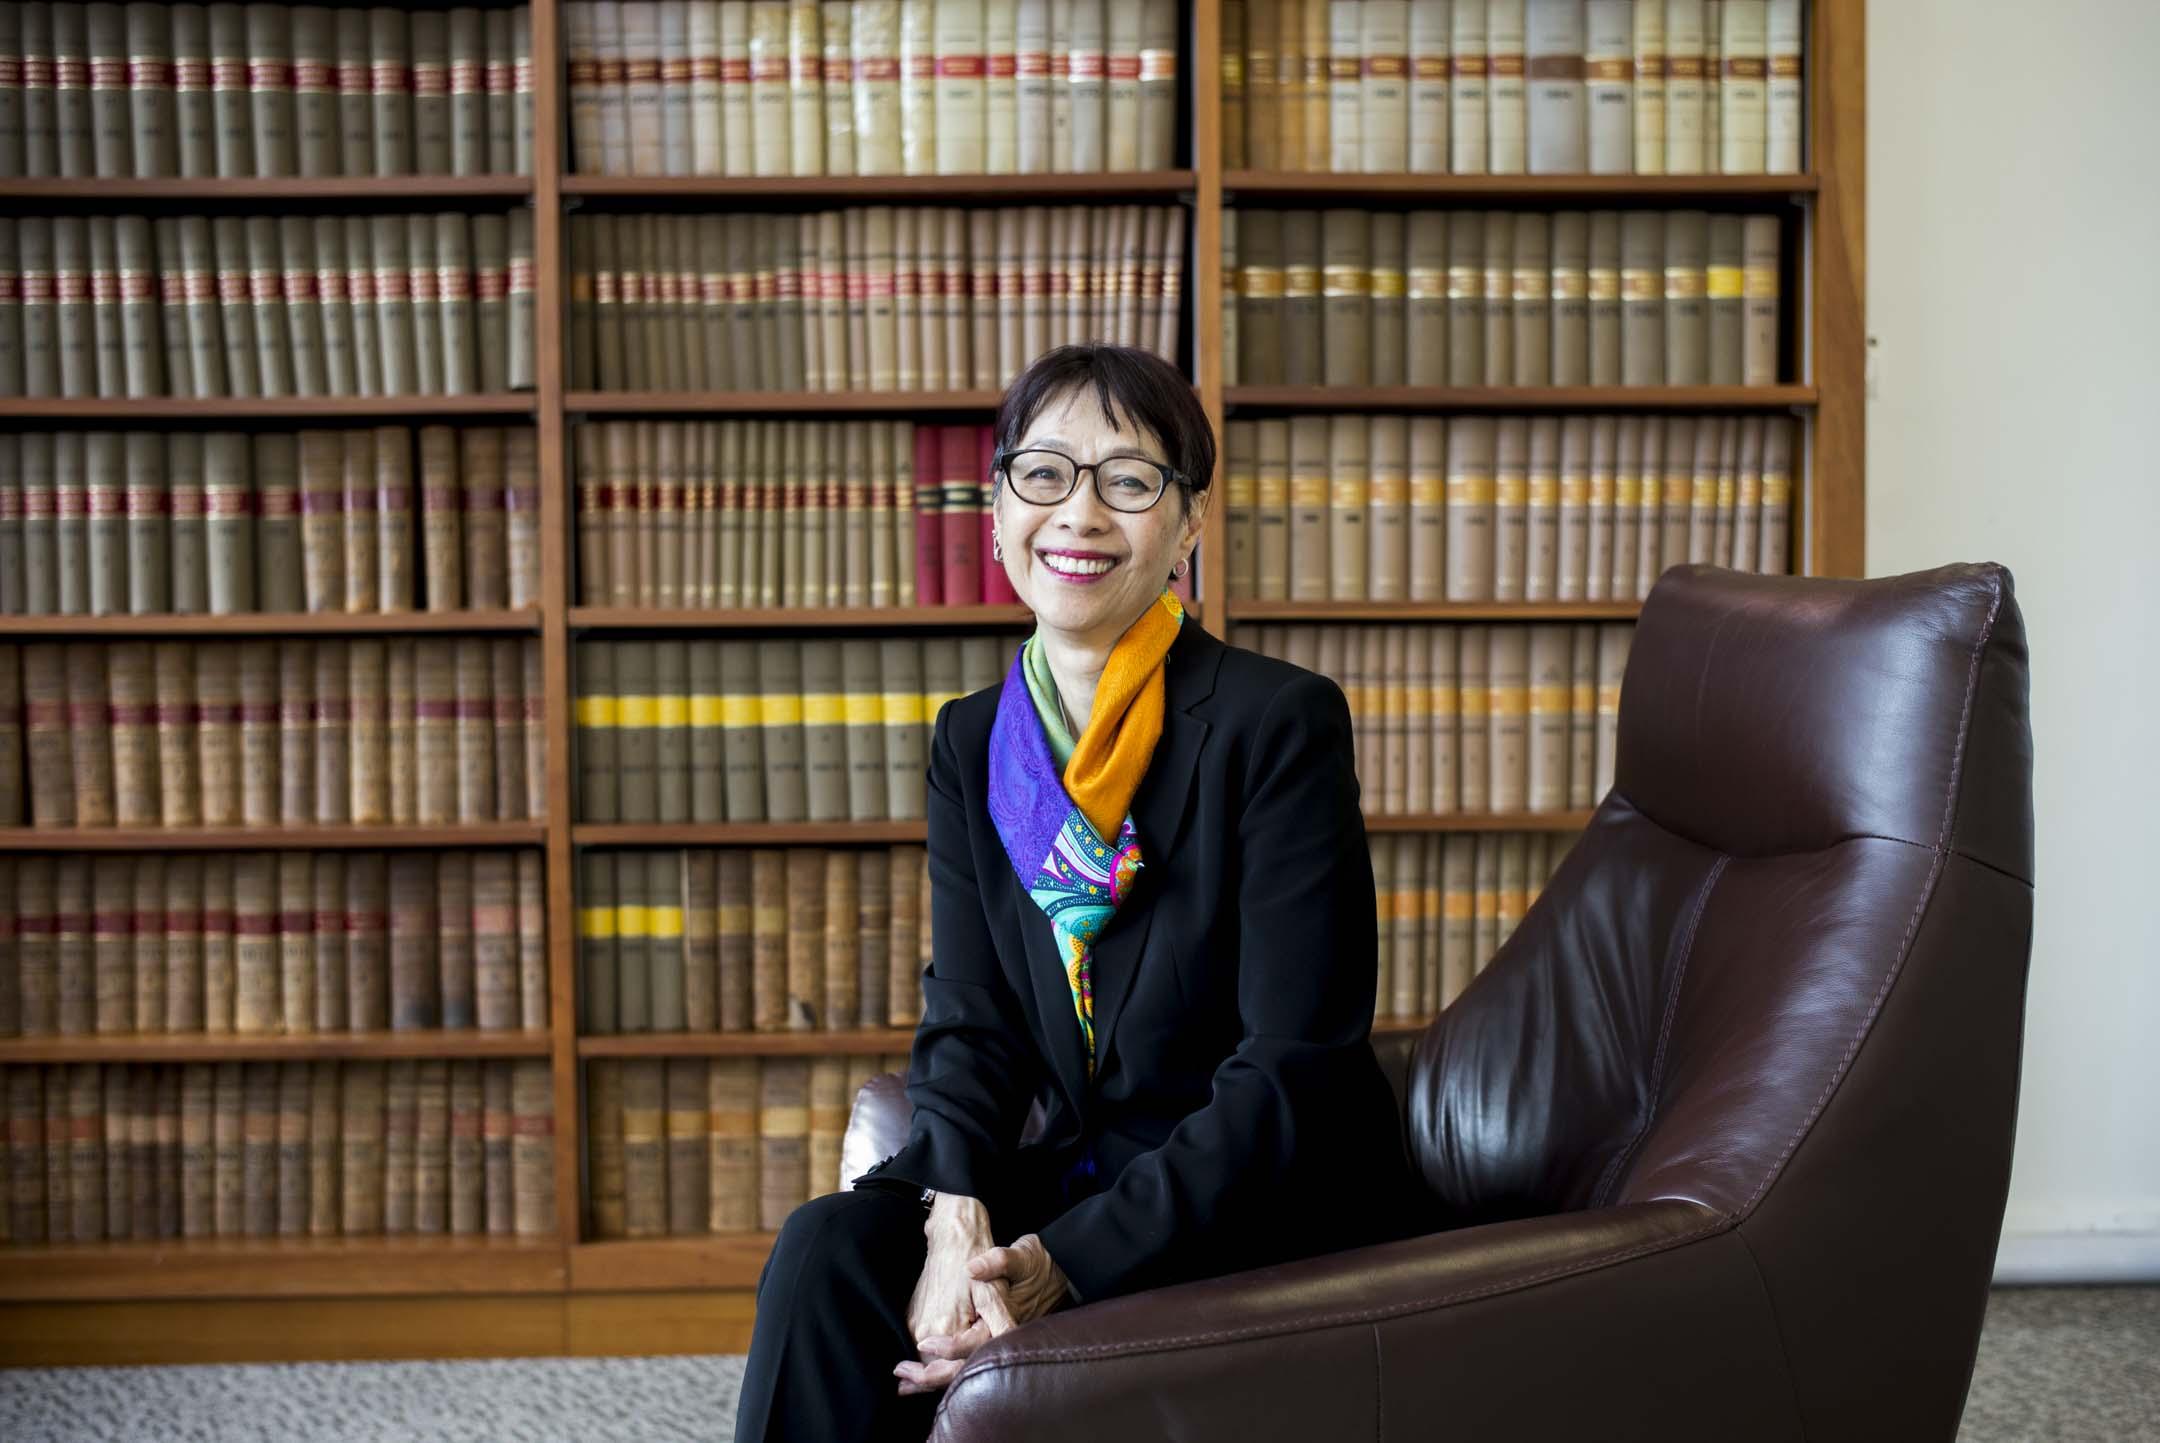 NGO「中國人權」的執行主任譚競嫦(Sharon Hom)以香港大學法律學院訪問教授的身份來回港,是反修例運動爆發以來第二次。 攝:林振東/端傳媒